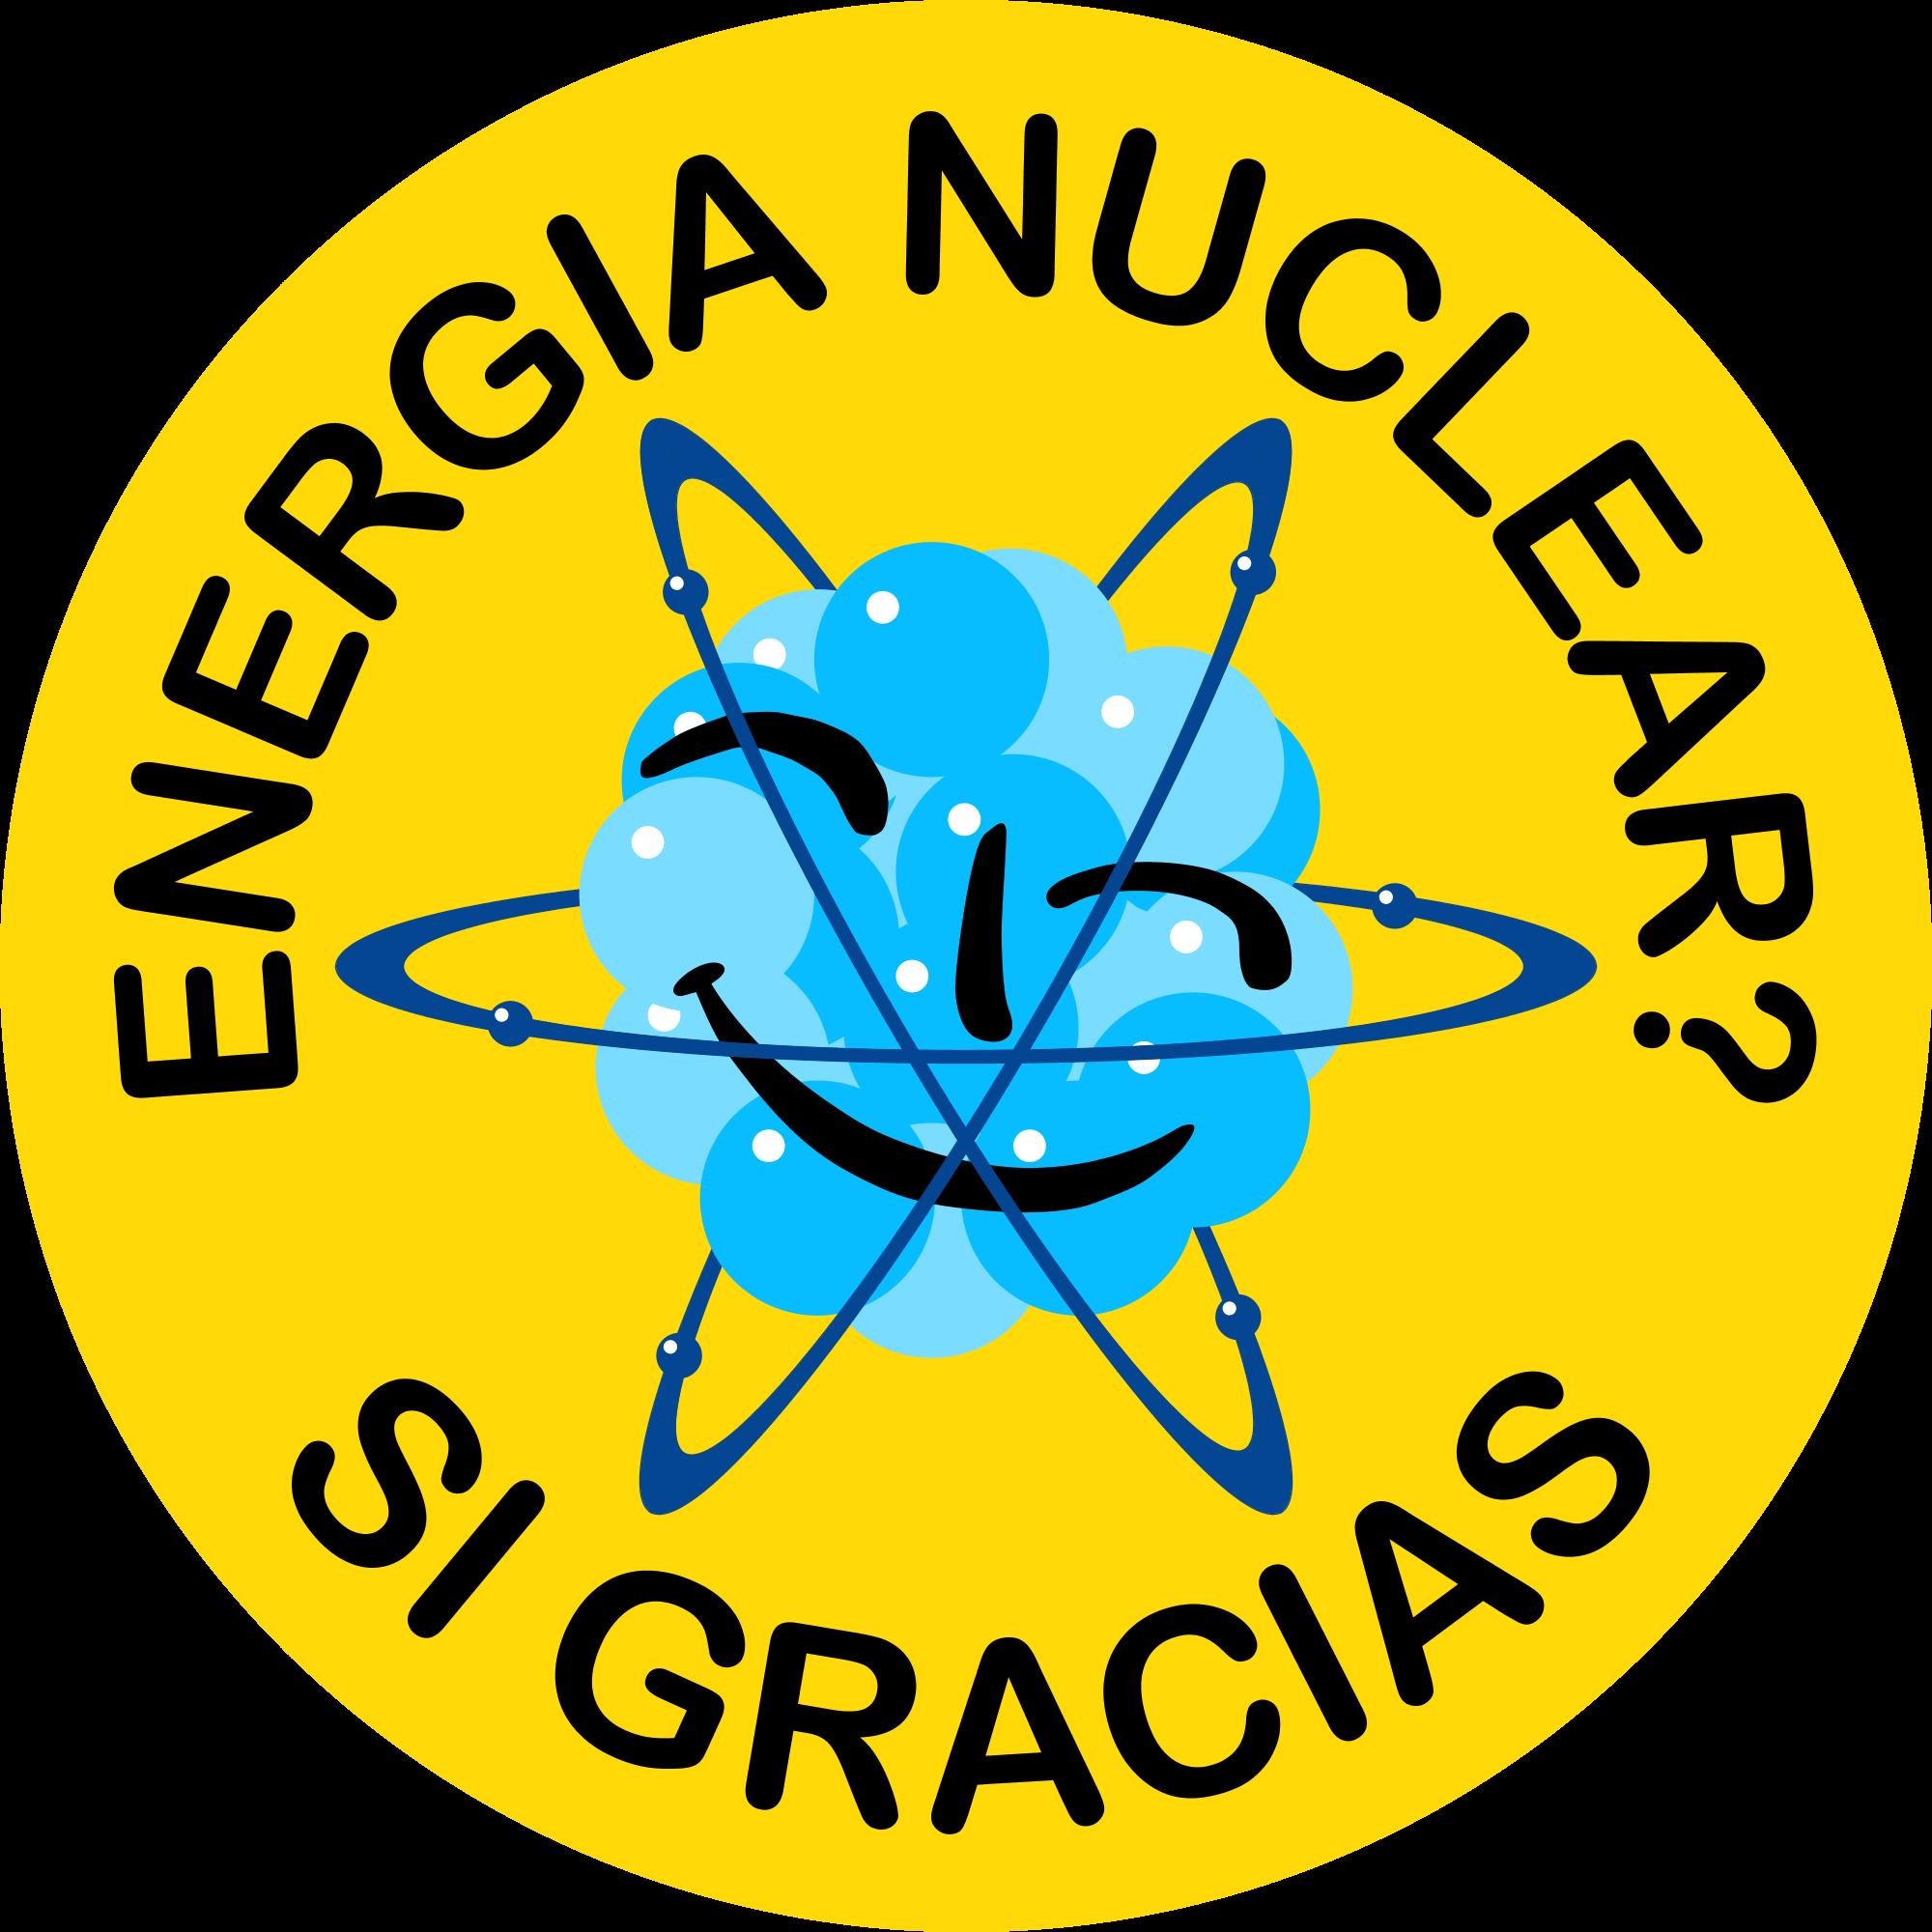 Imagenes De La Energia Nuclear